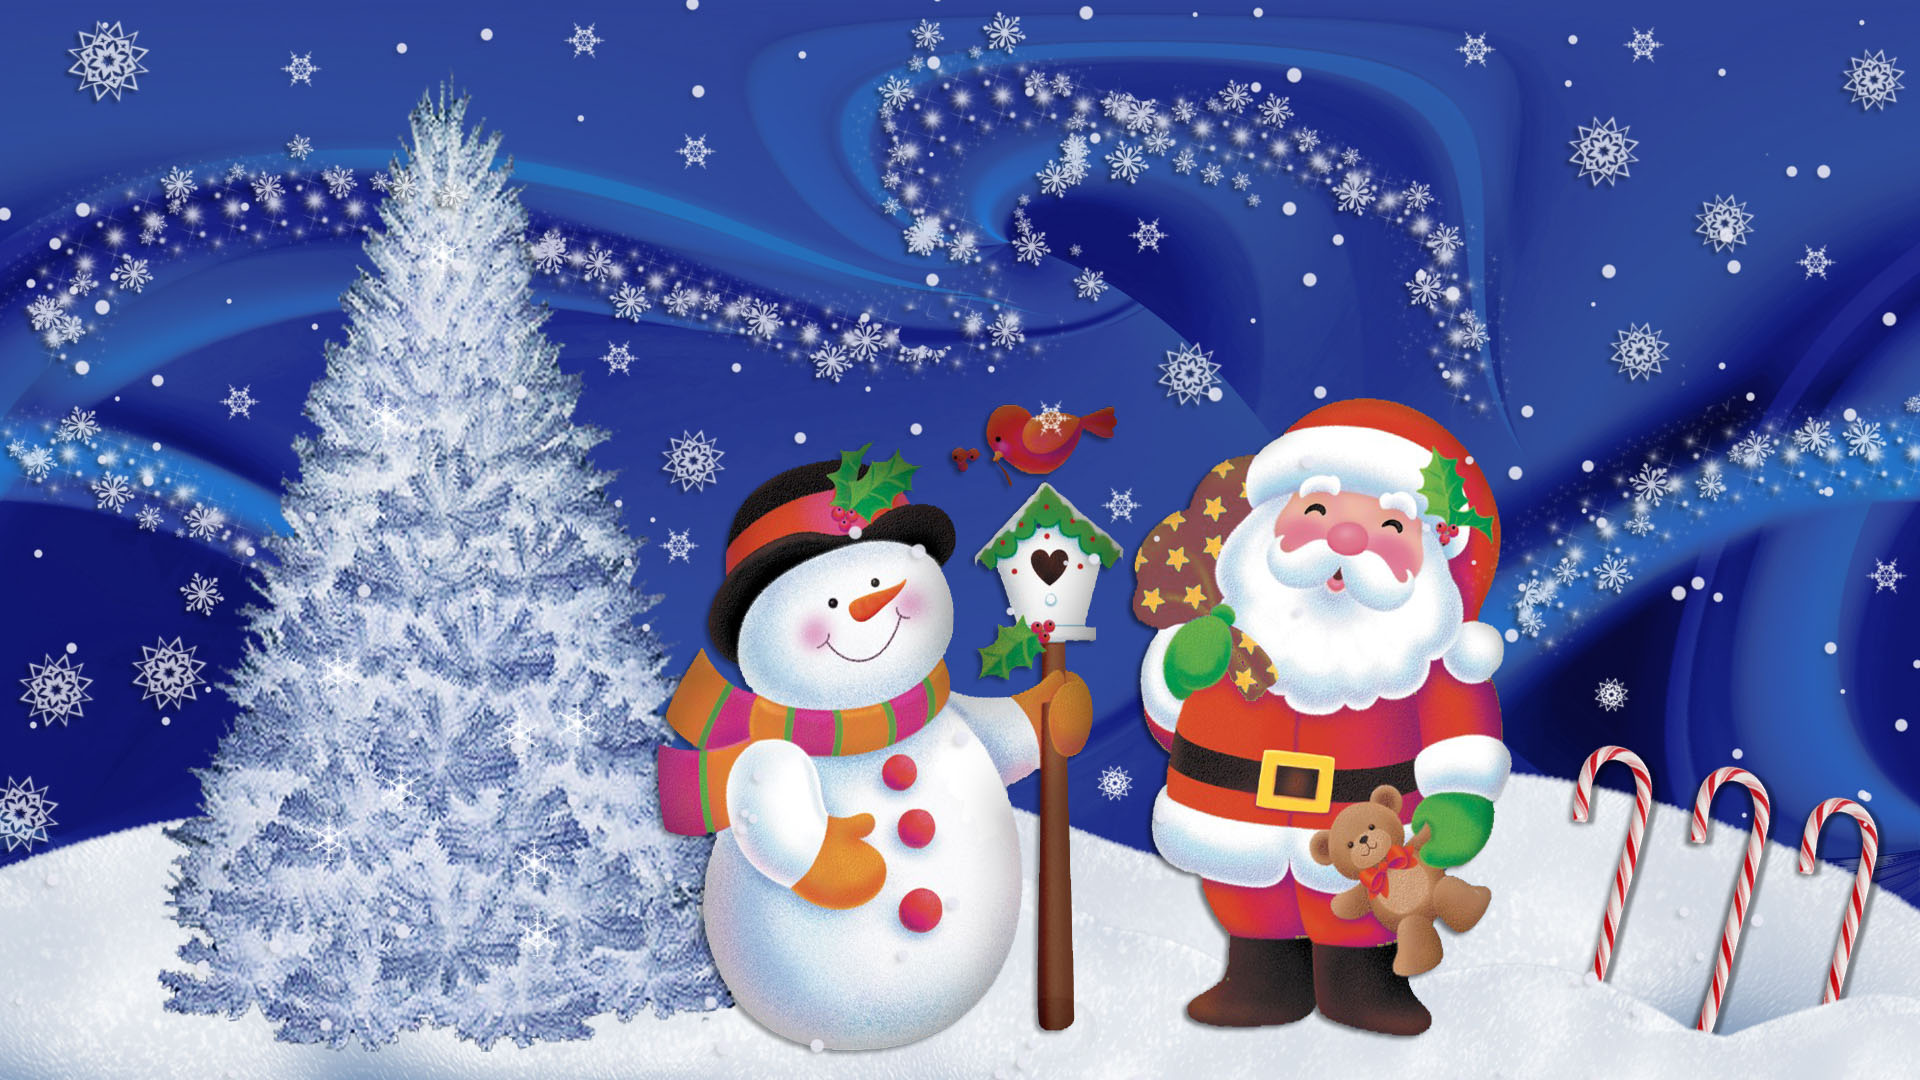 Hoo Hoo Christmas Santa claus Cute Walllpaper1